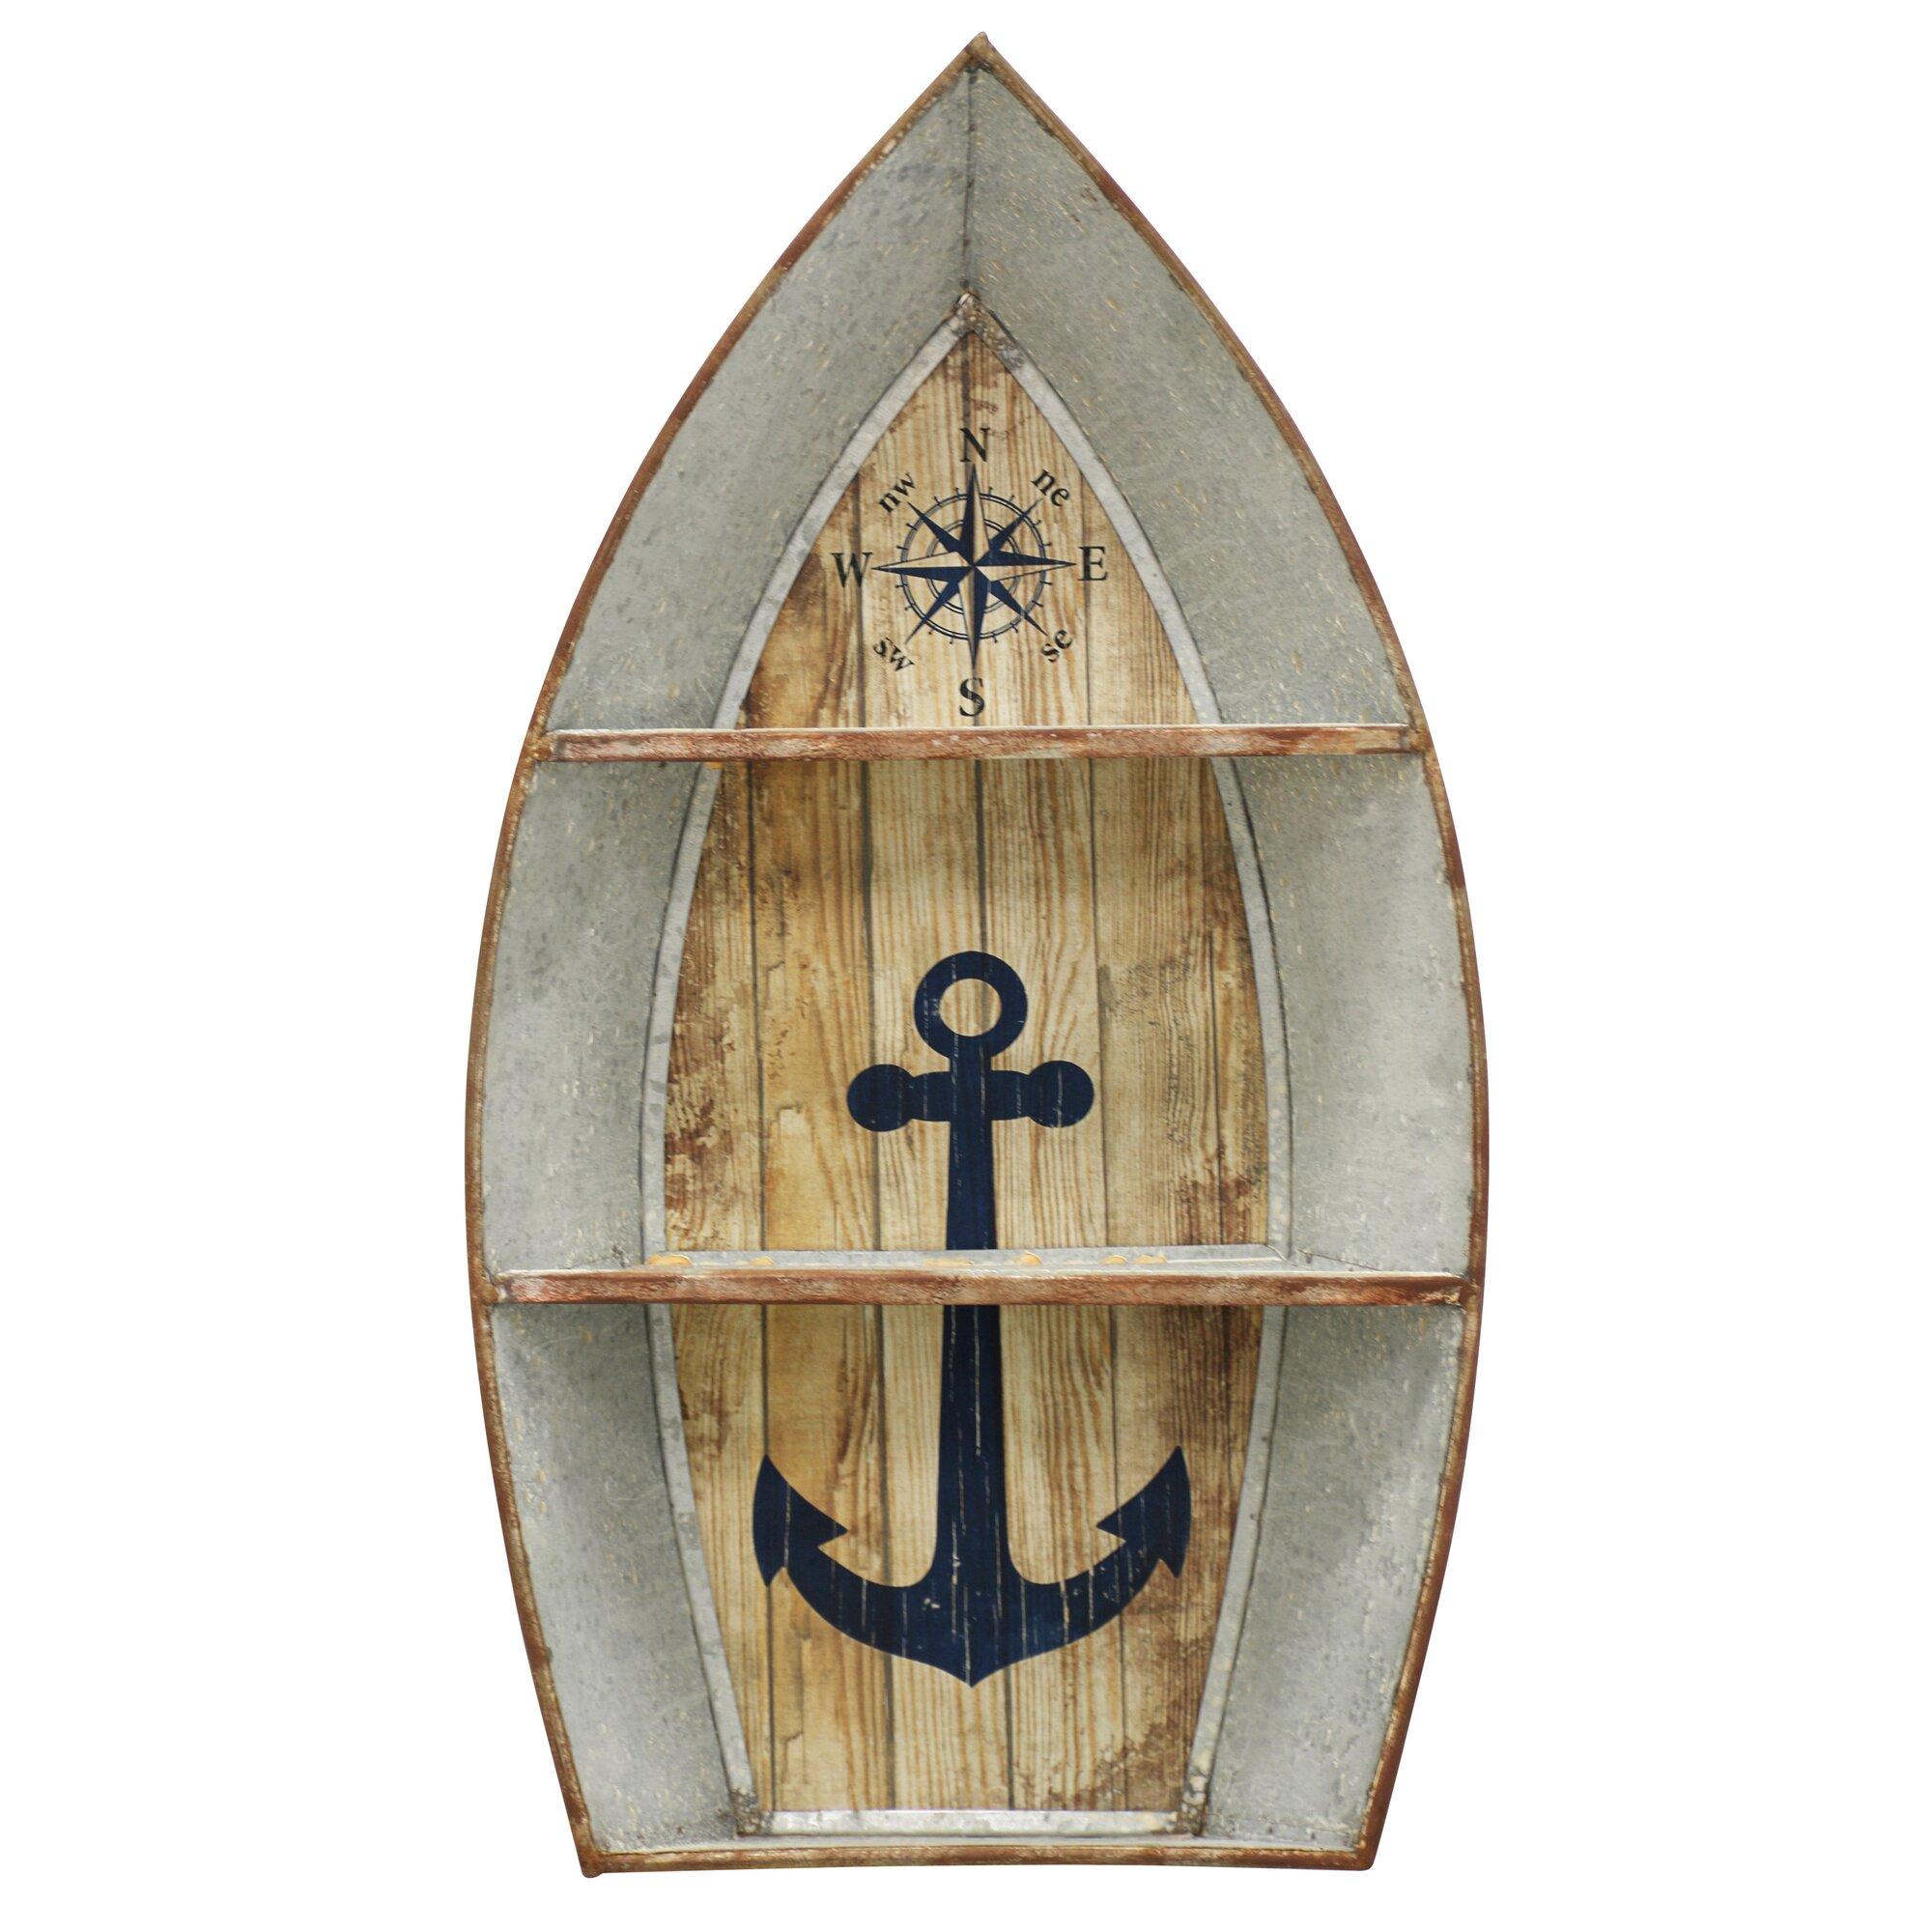 nautical metal boat shelves wall decor reviews birch lane. Black Bedroom Furniture Sets. Home Design Ideas